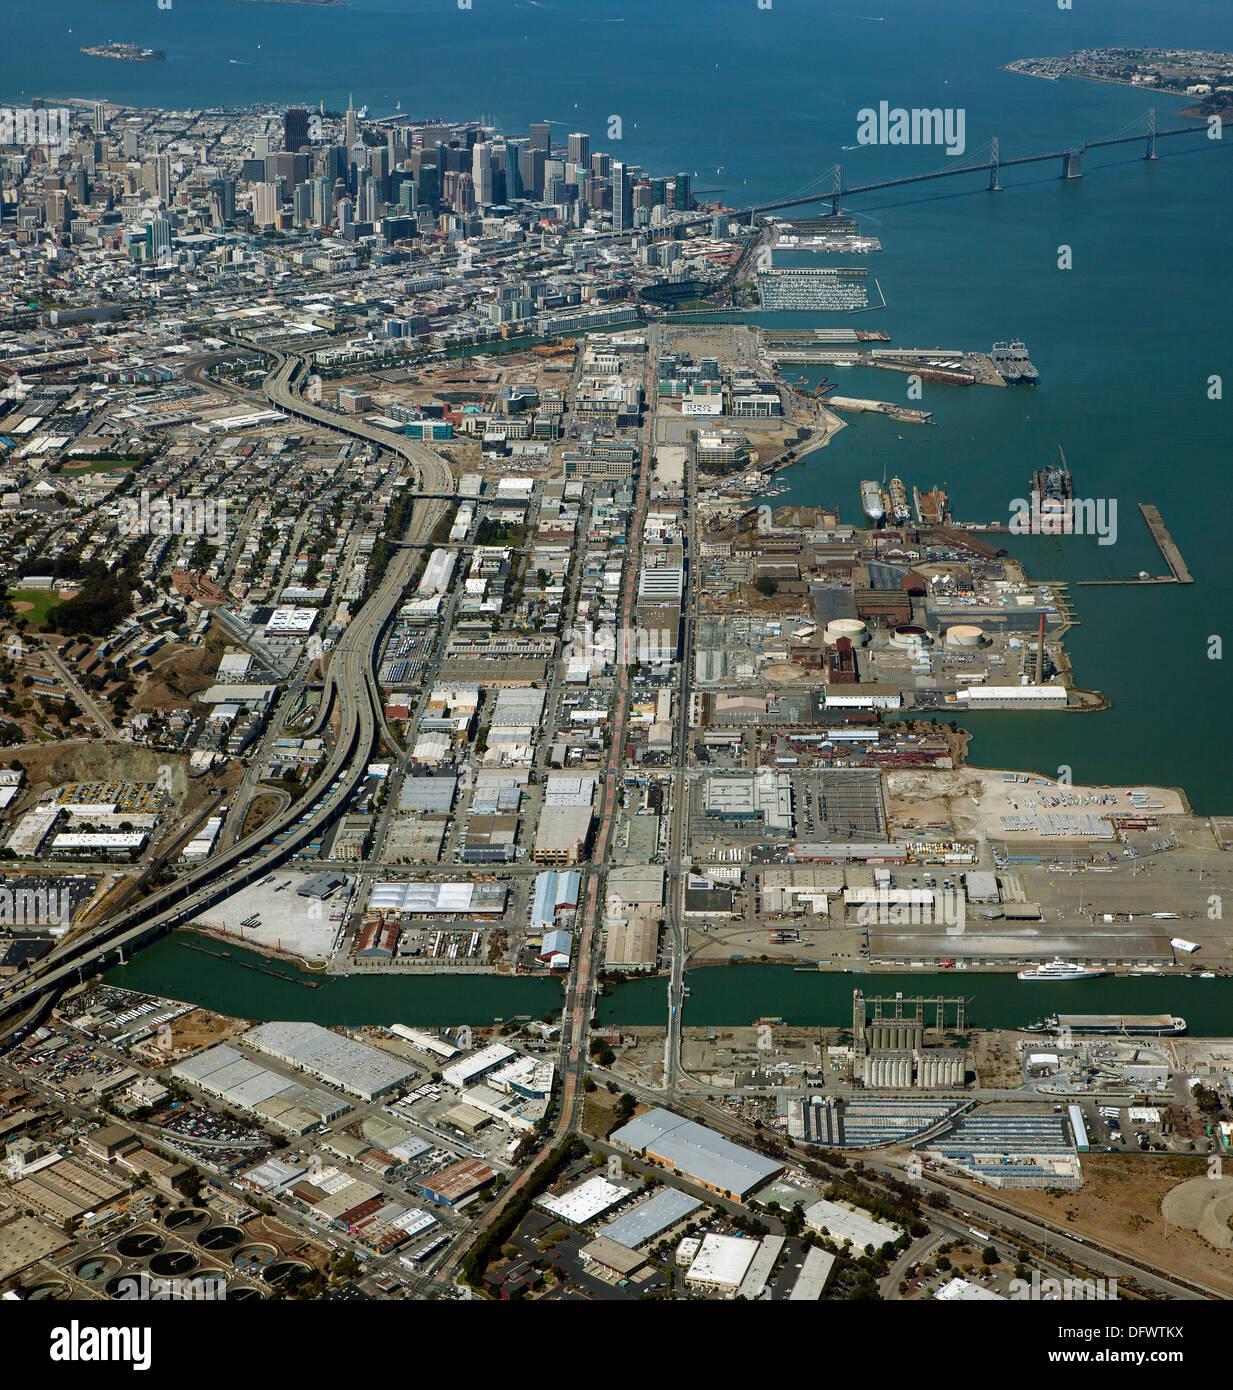 Aerial photograph Third Street Corridor, Pier 70, Mission Bay, San Francisco California - Stock Image